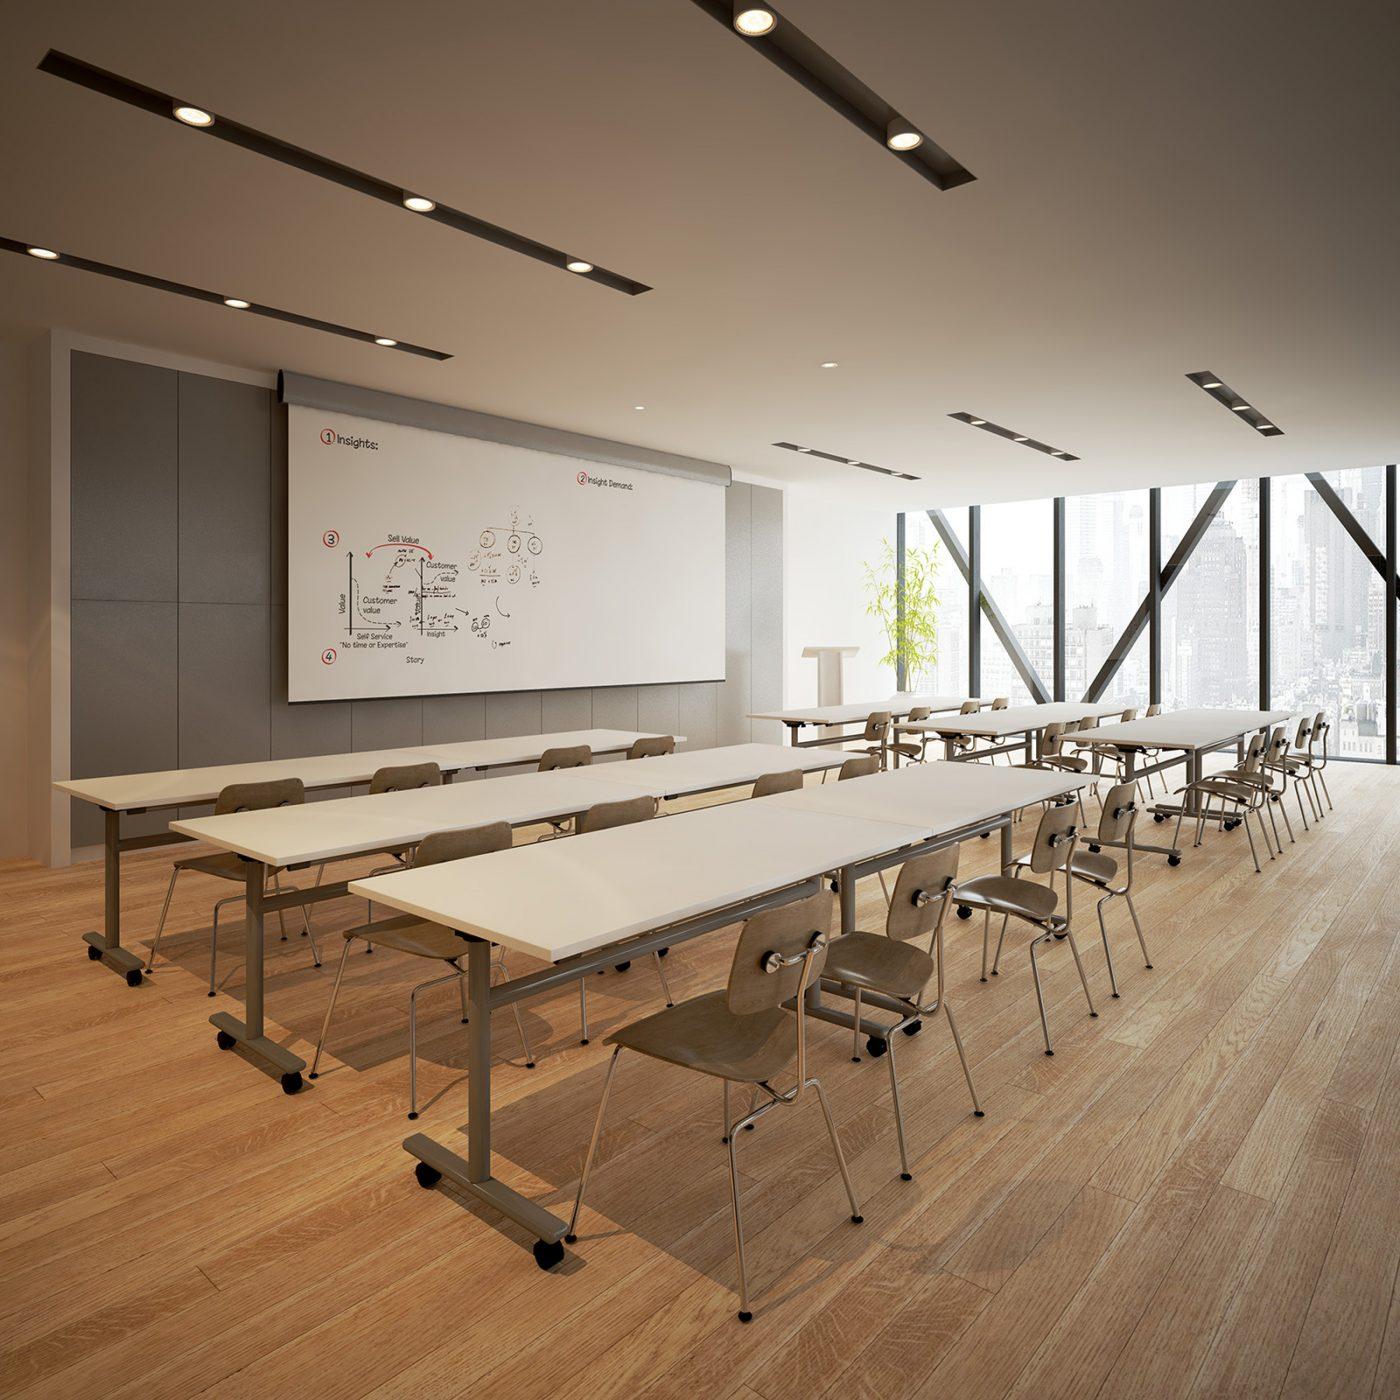 flip top table, bank of desks, classroom furniture, MFC, metal leg